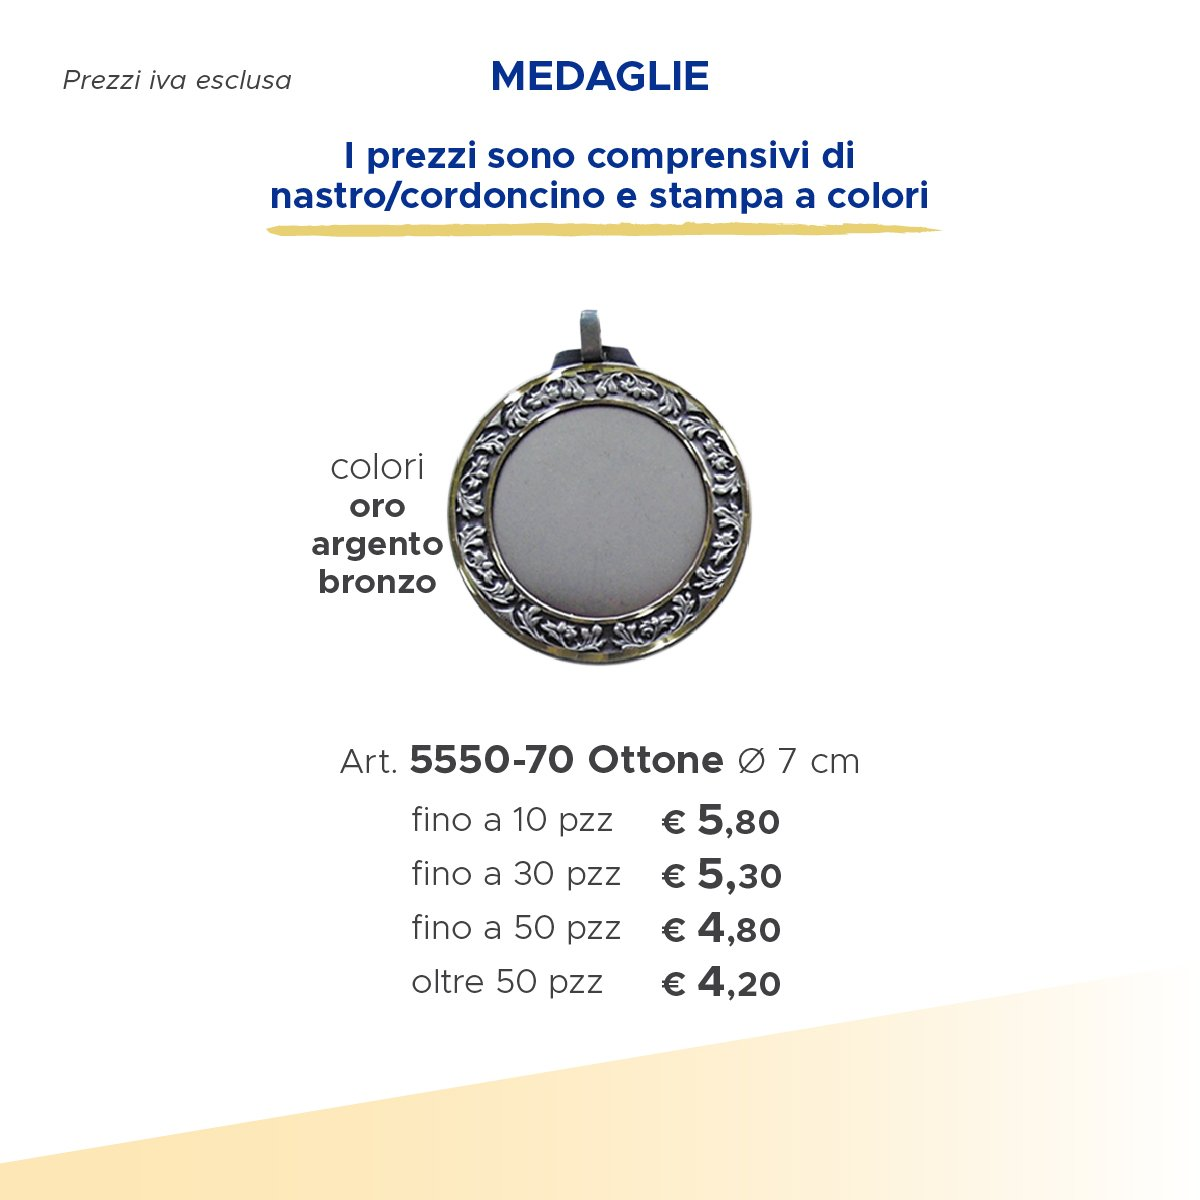 medaglia in argento